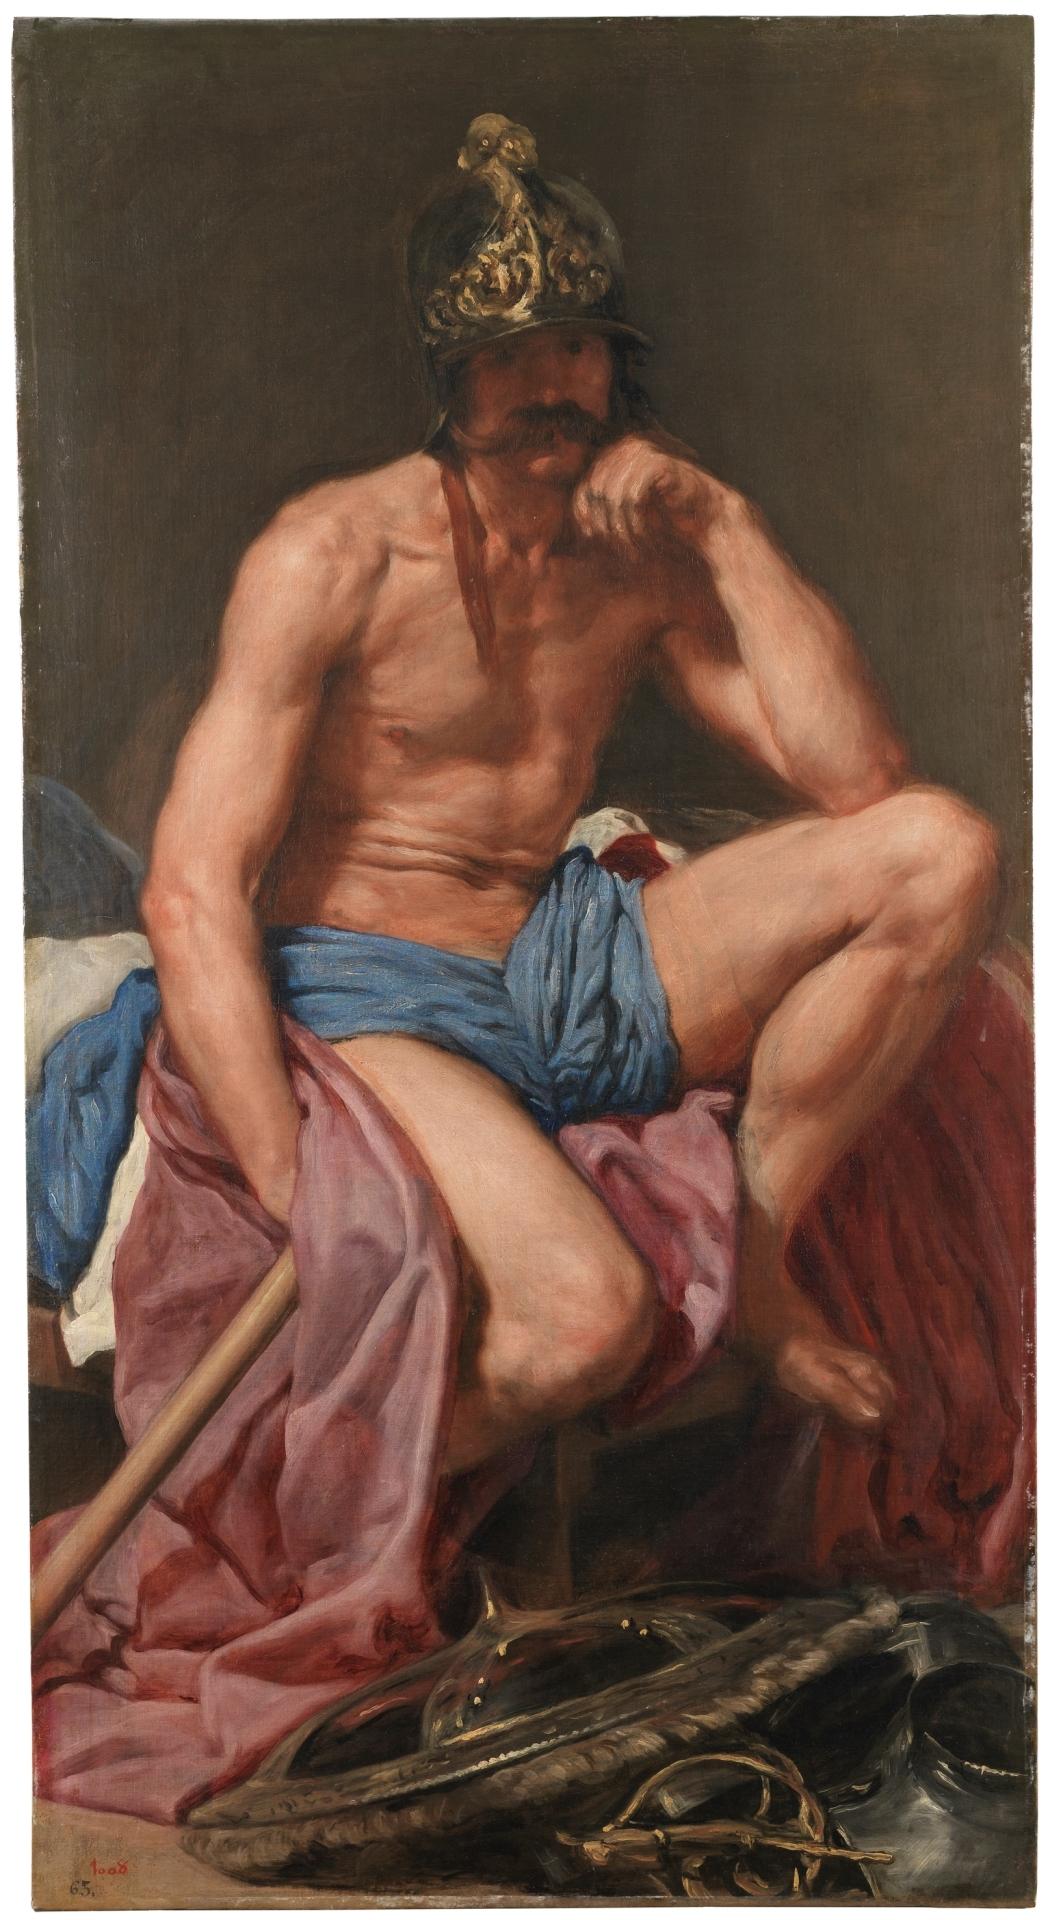 Diego Velázquez, Mars, c.1638, Prado, Madrid